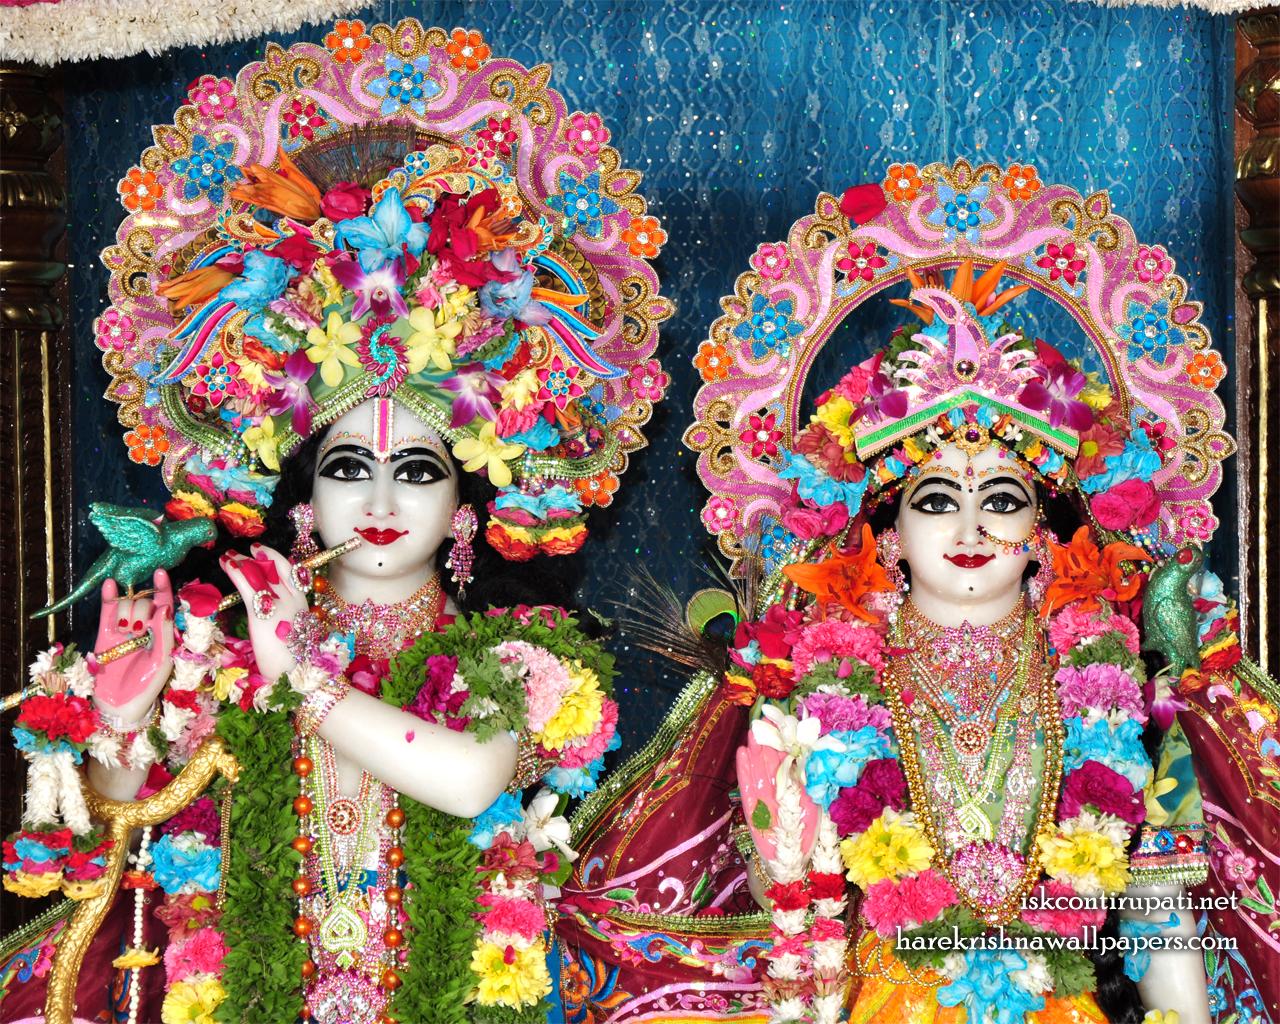 Sri Sri Radha Govinda Close up Wallpaper (002) Size 1280x1024 Download